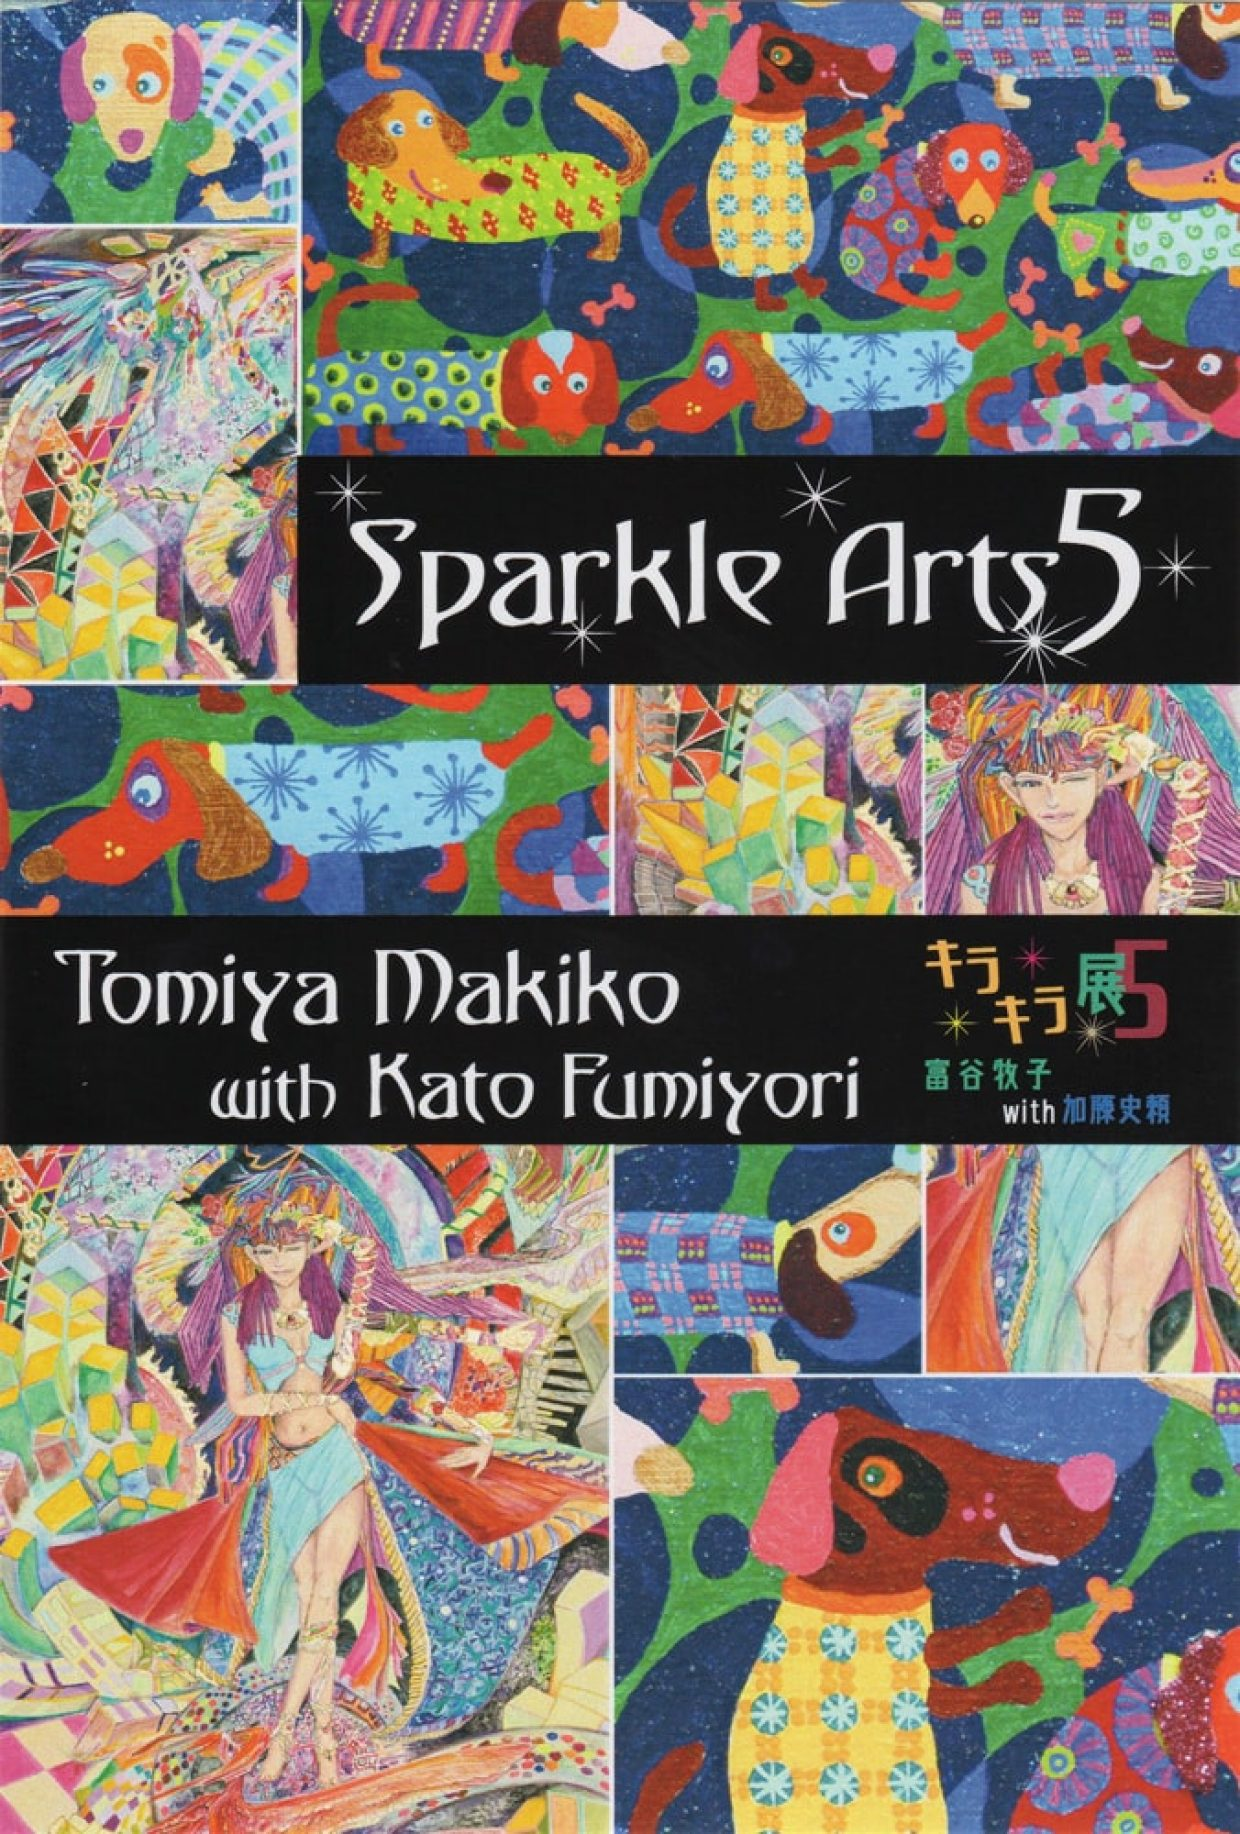 Sparkle Arts 5